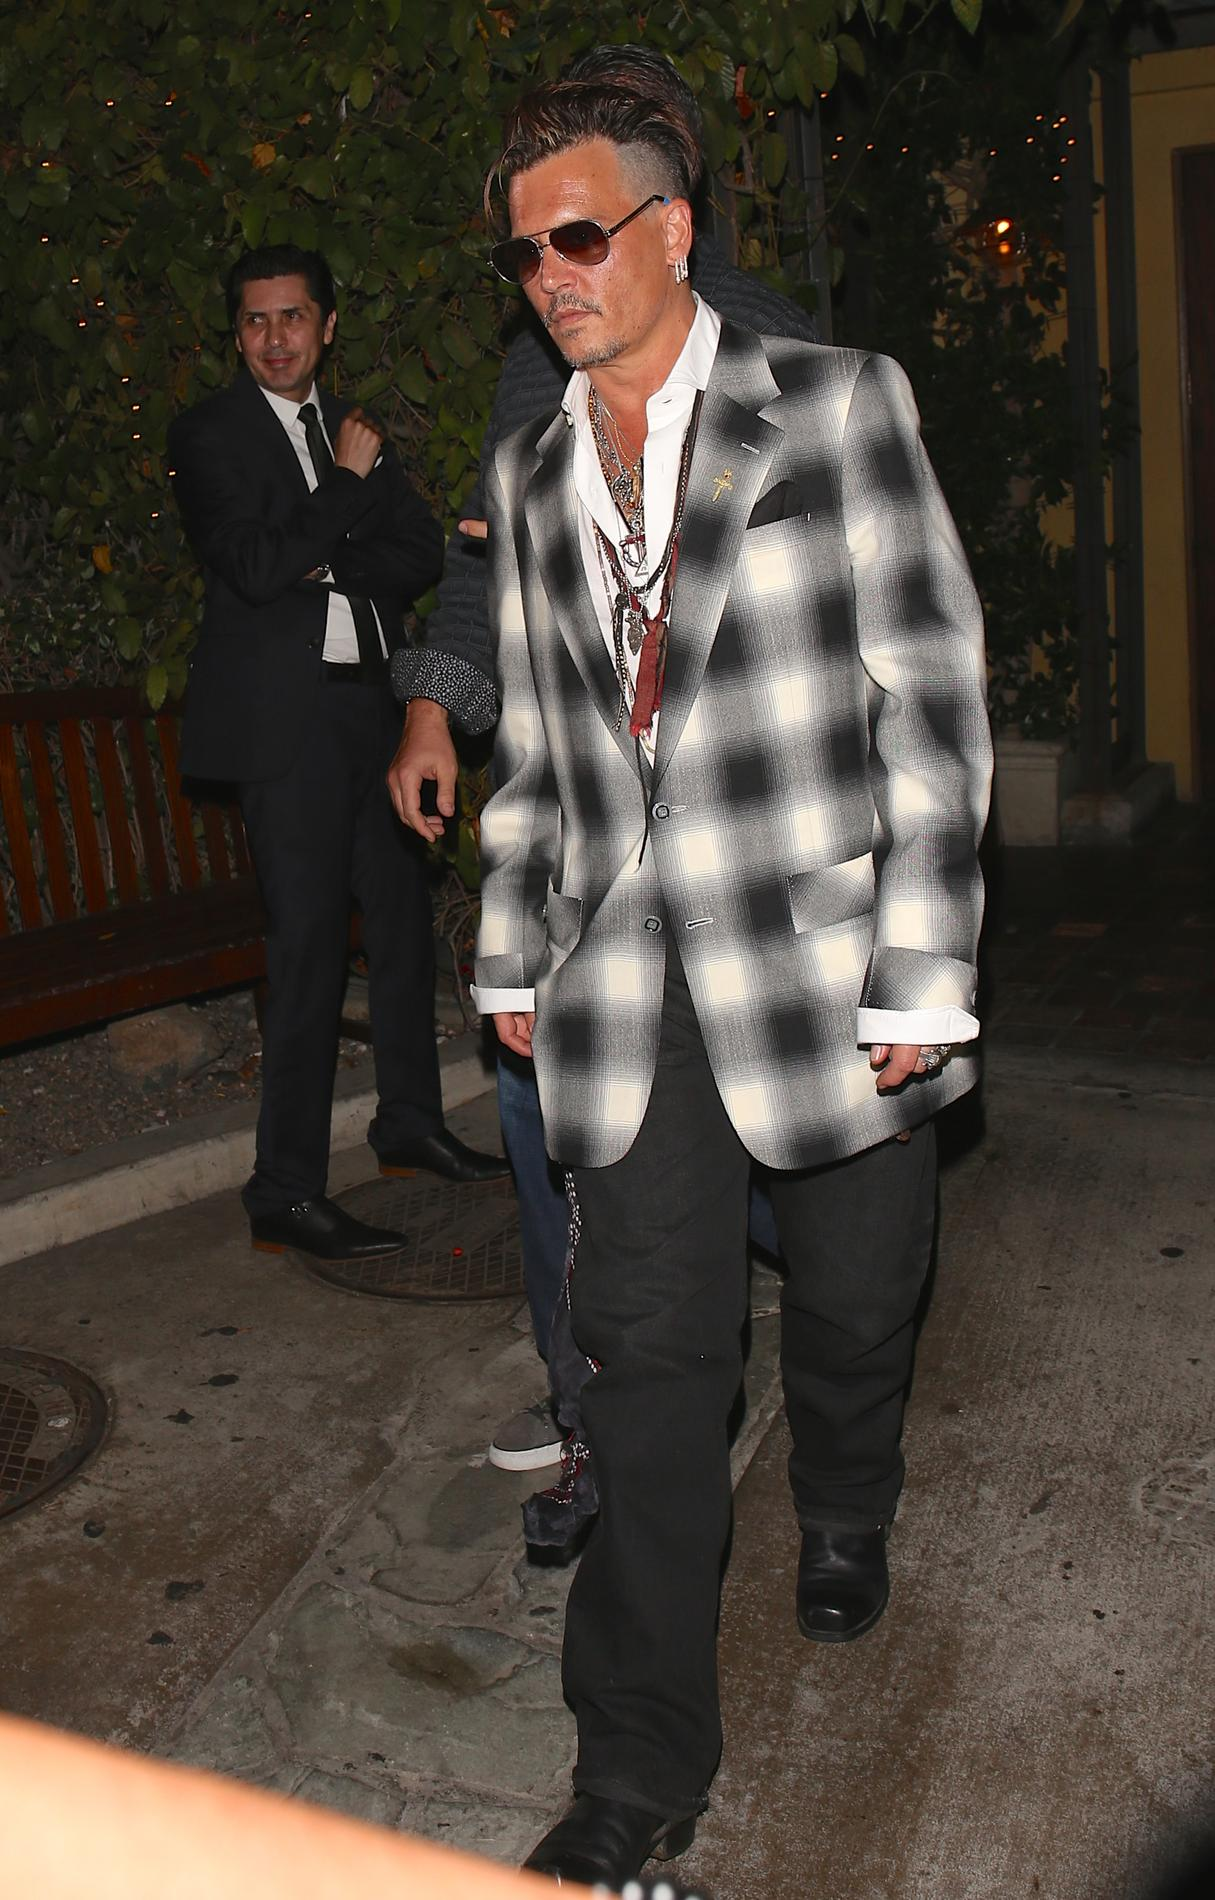 Johnny Depp Modifie Un Tatouage Pour Insulter Amber Heard Madame